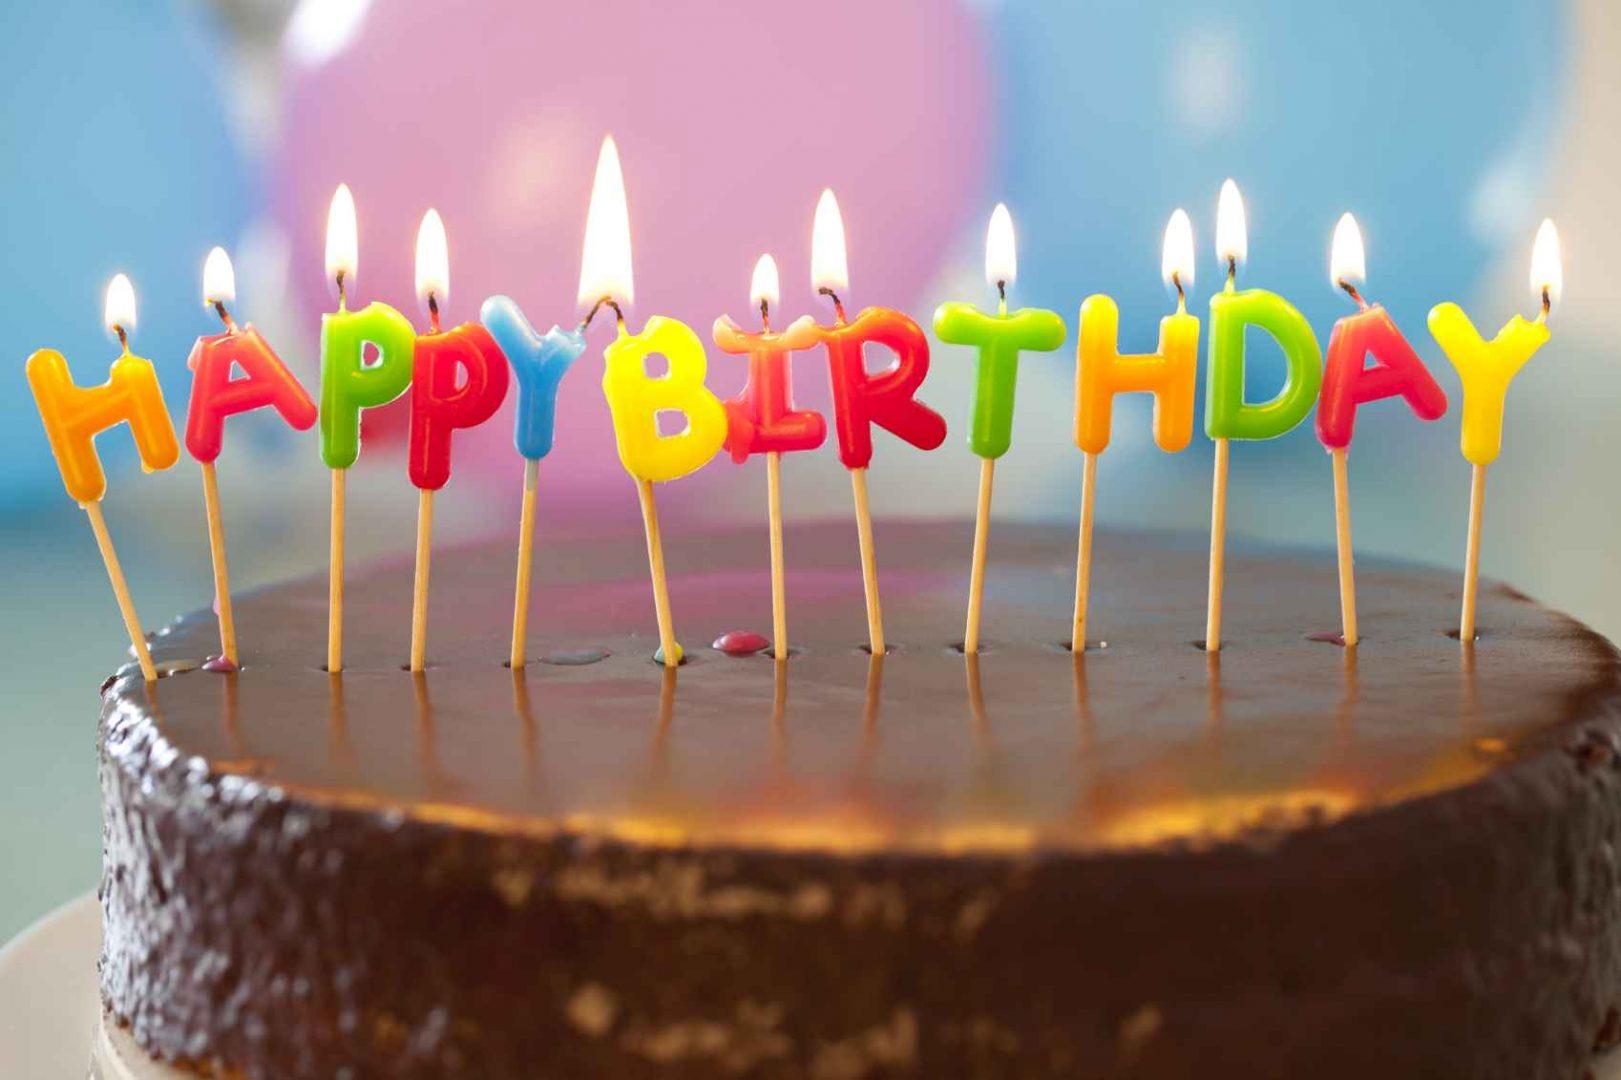 Birthday Cake Wallpaper 7465 Hdwpro